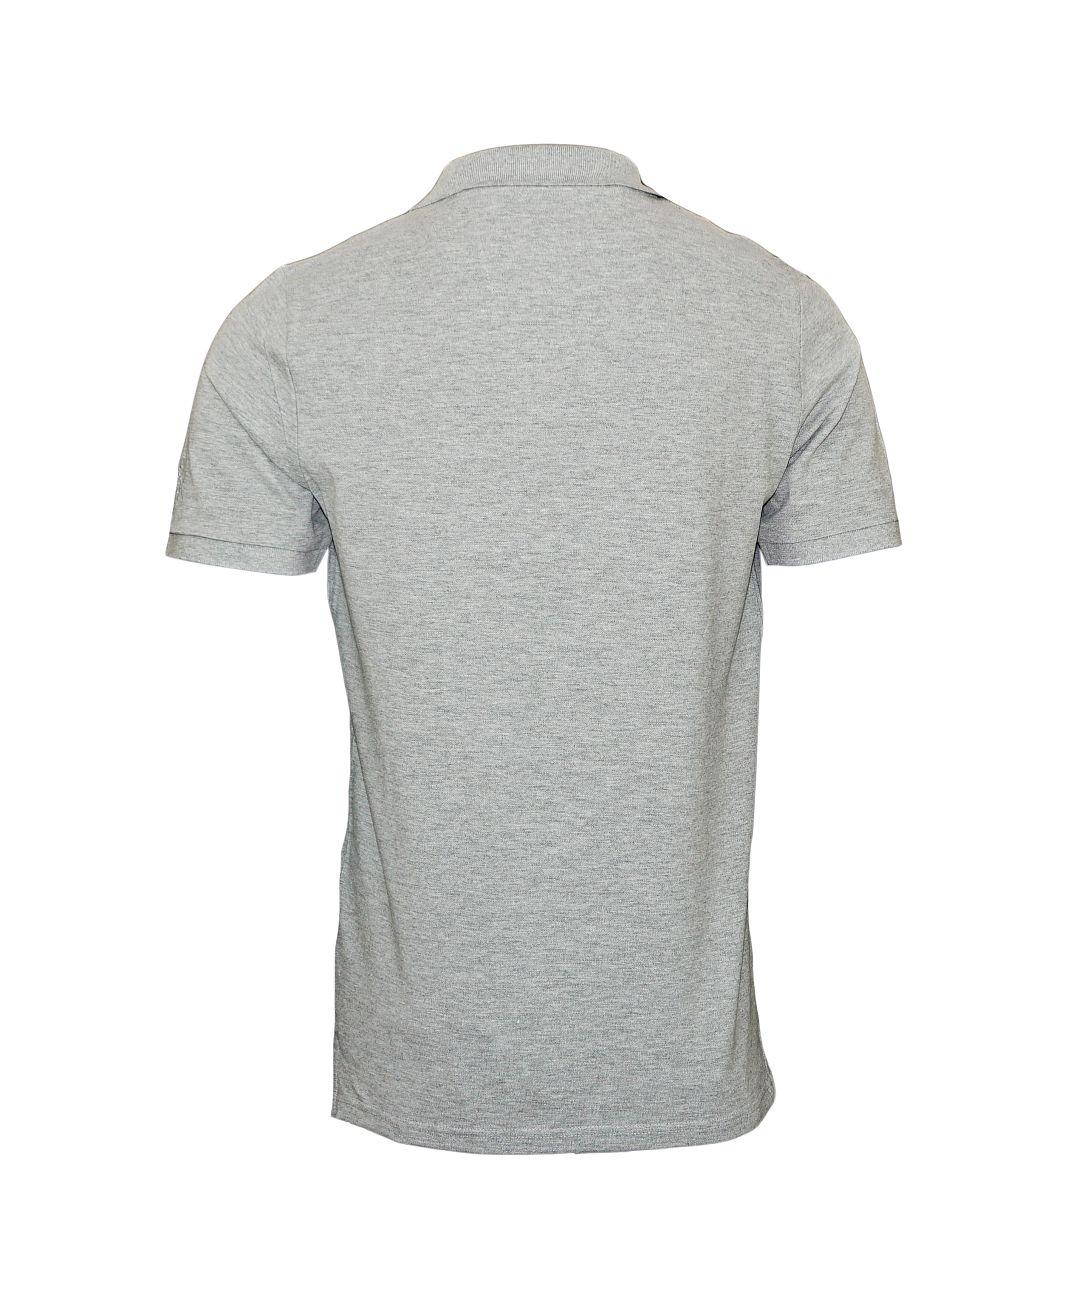 Daniel Hechter Poloshirt Polohemd 75021 181921 910 grau F18-DHP1